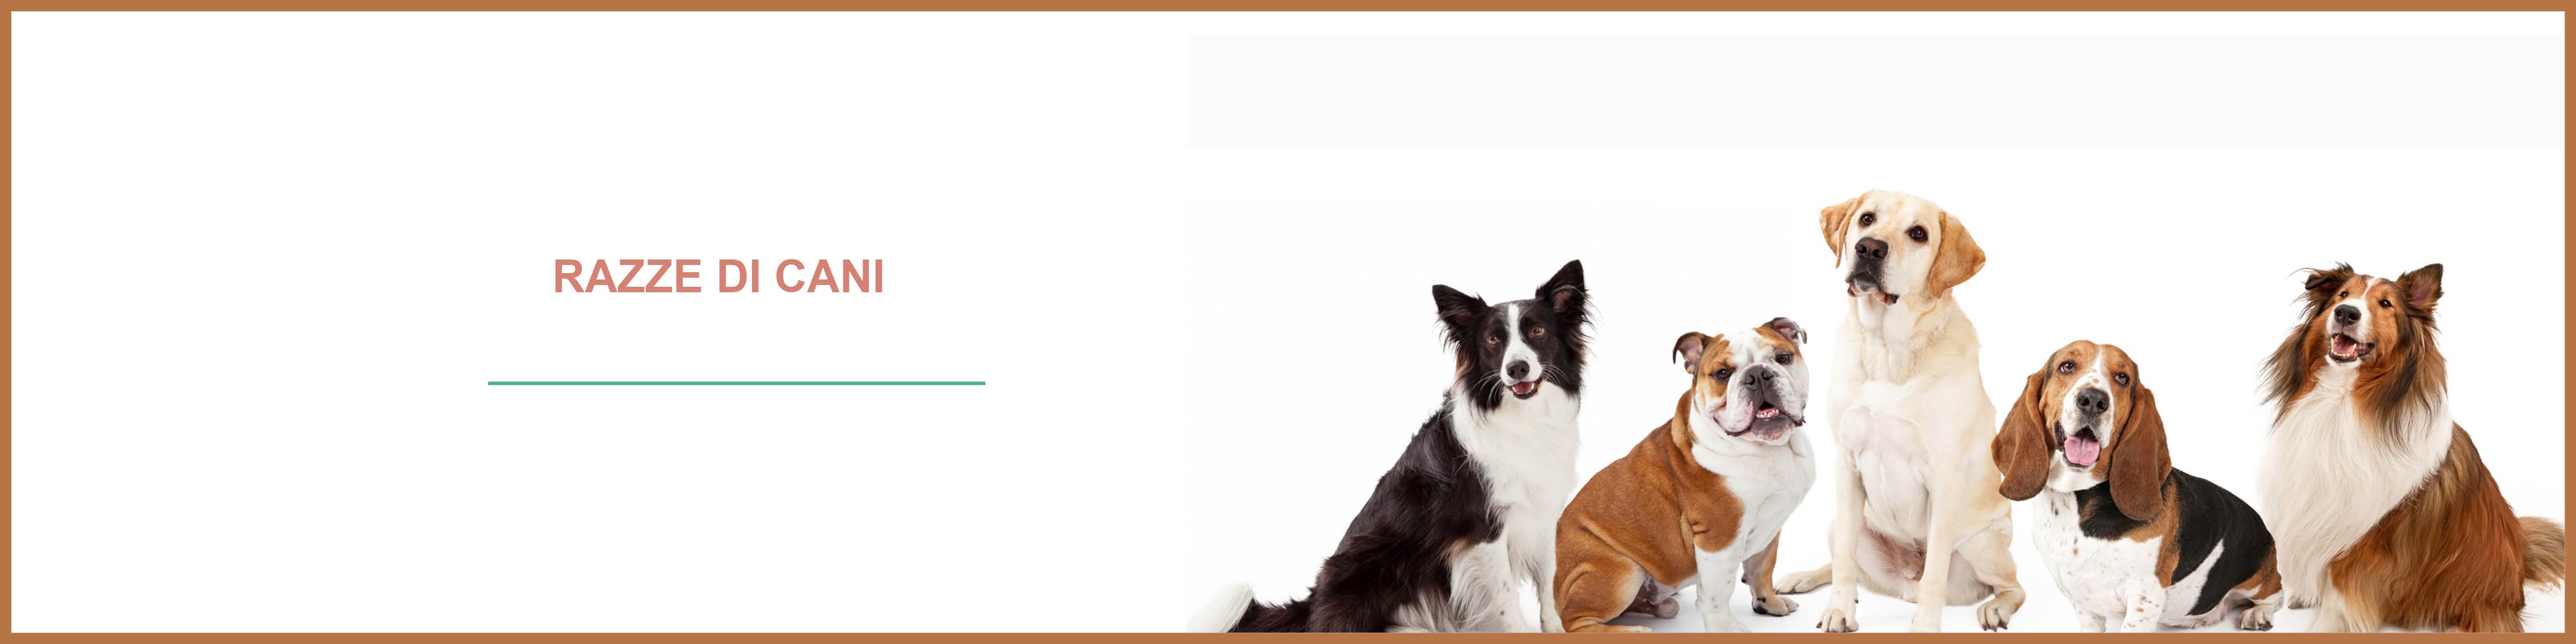 Blog cani : tutte le razze di cani, le razze dei cani